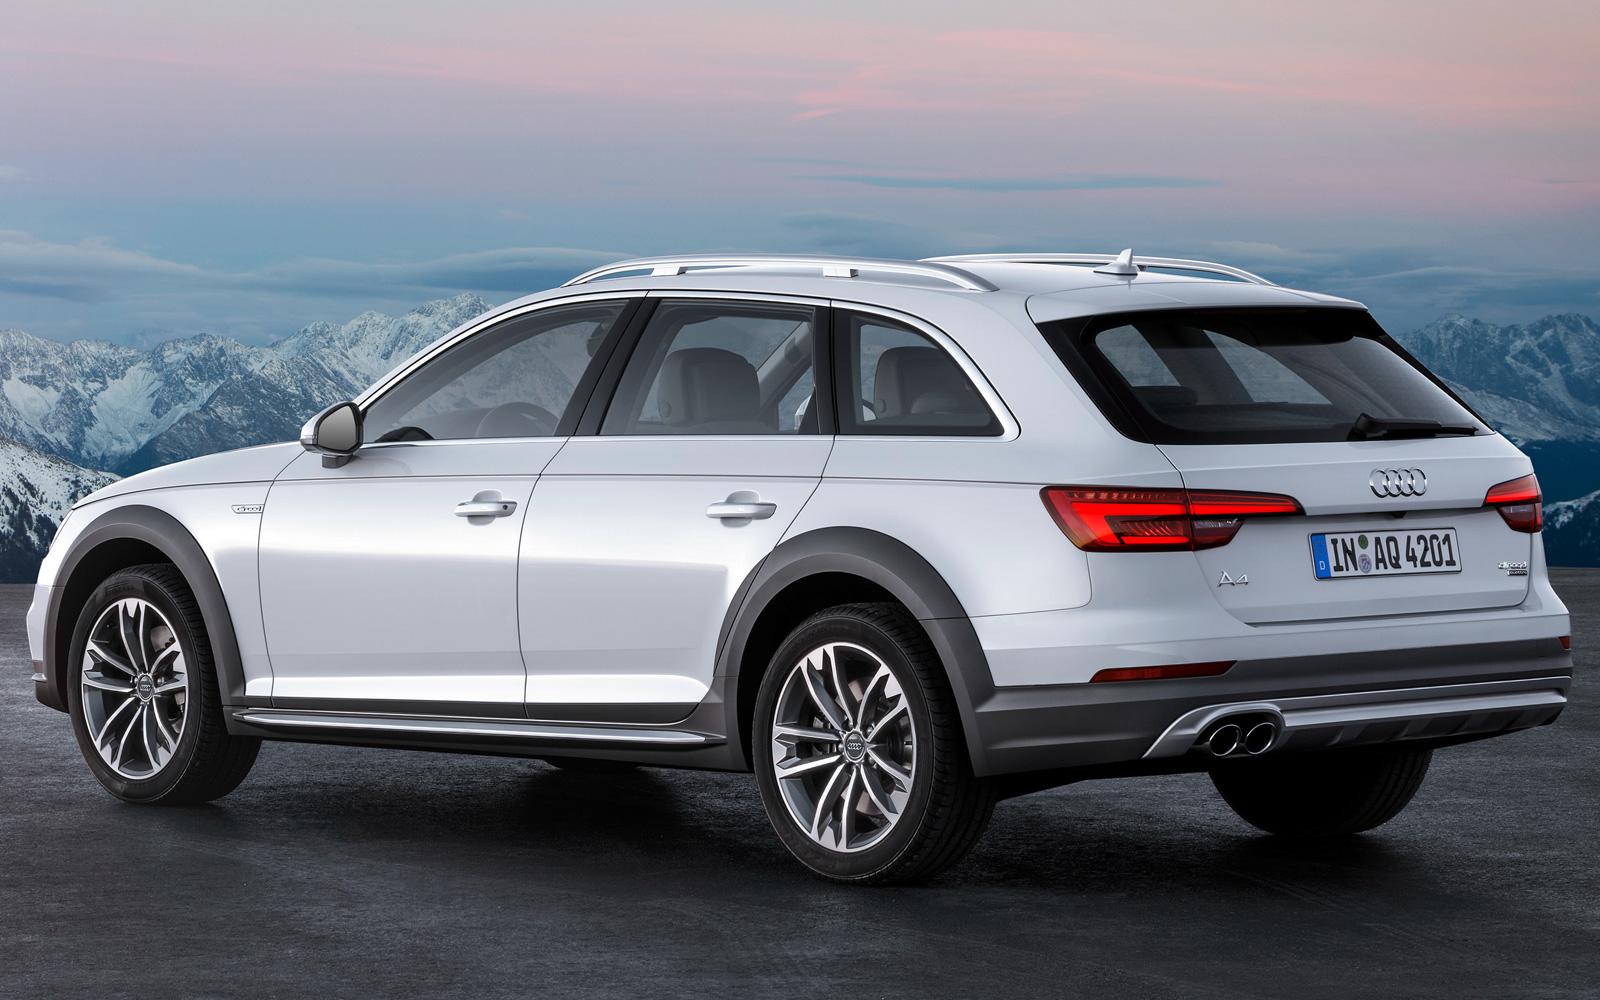 Audi A4 Allroad Quattro 2018 2019 цена и характеристики